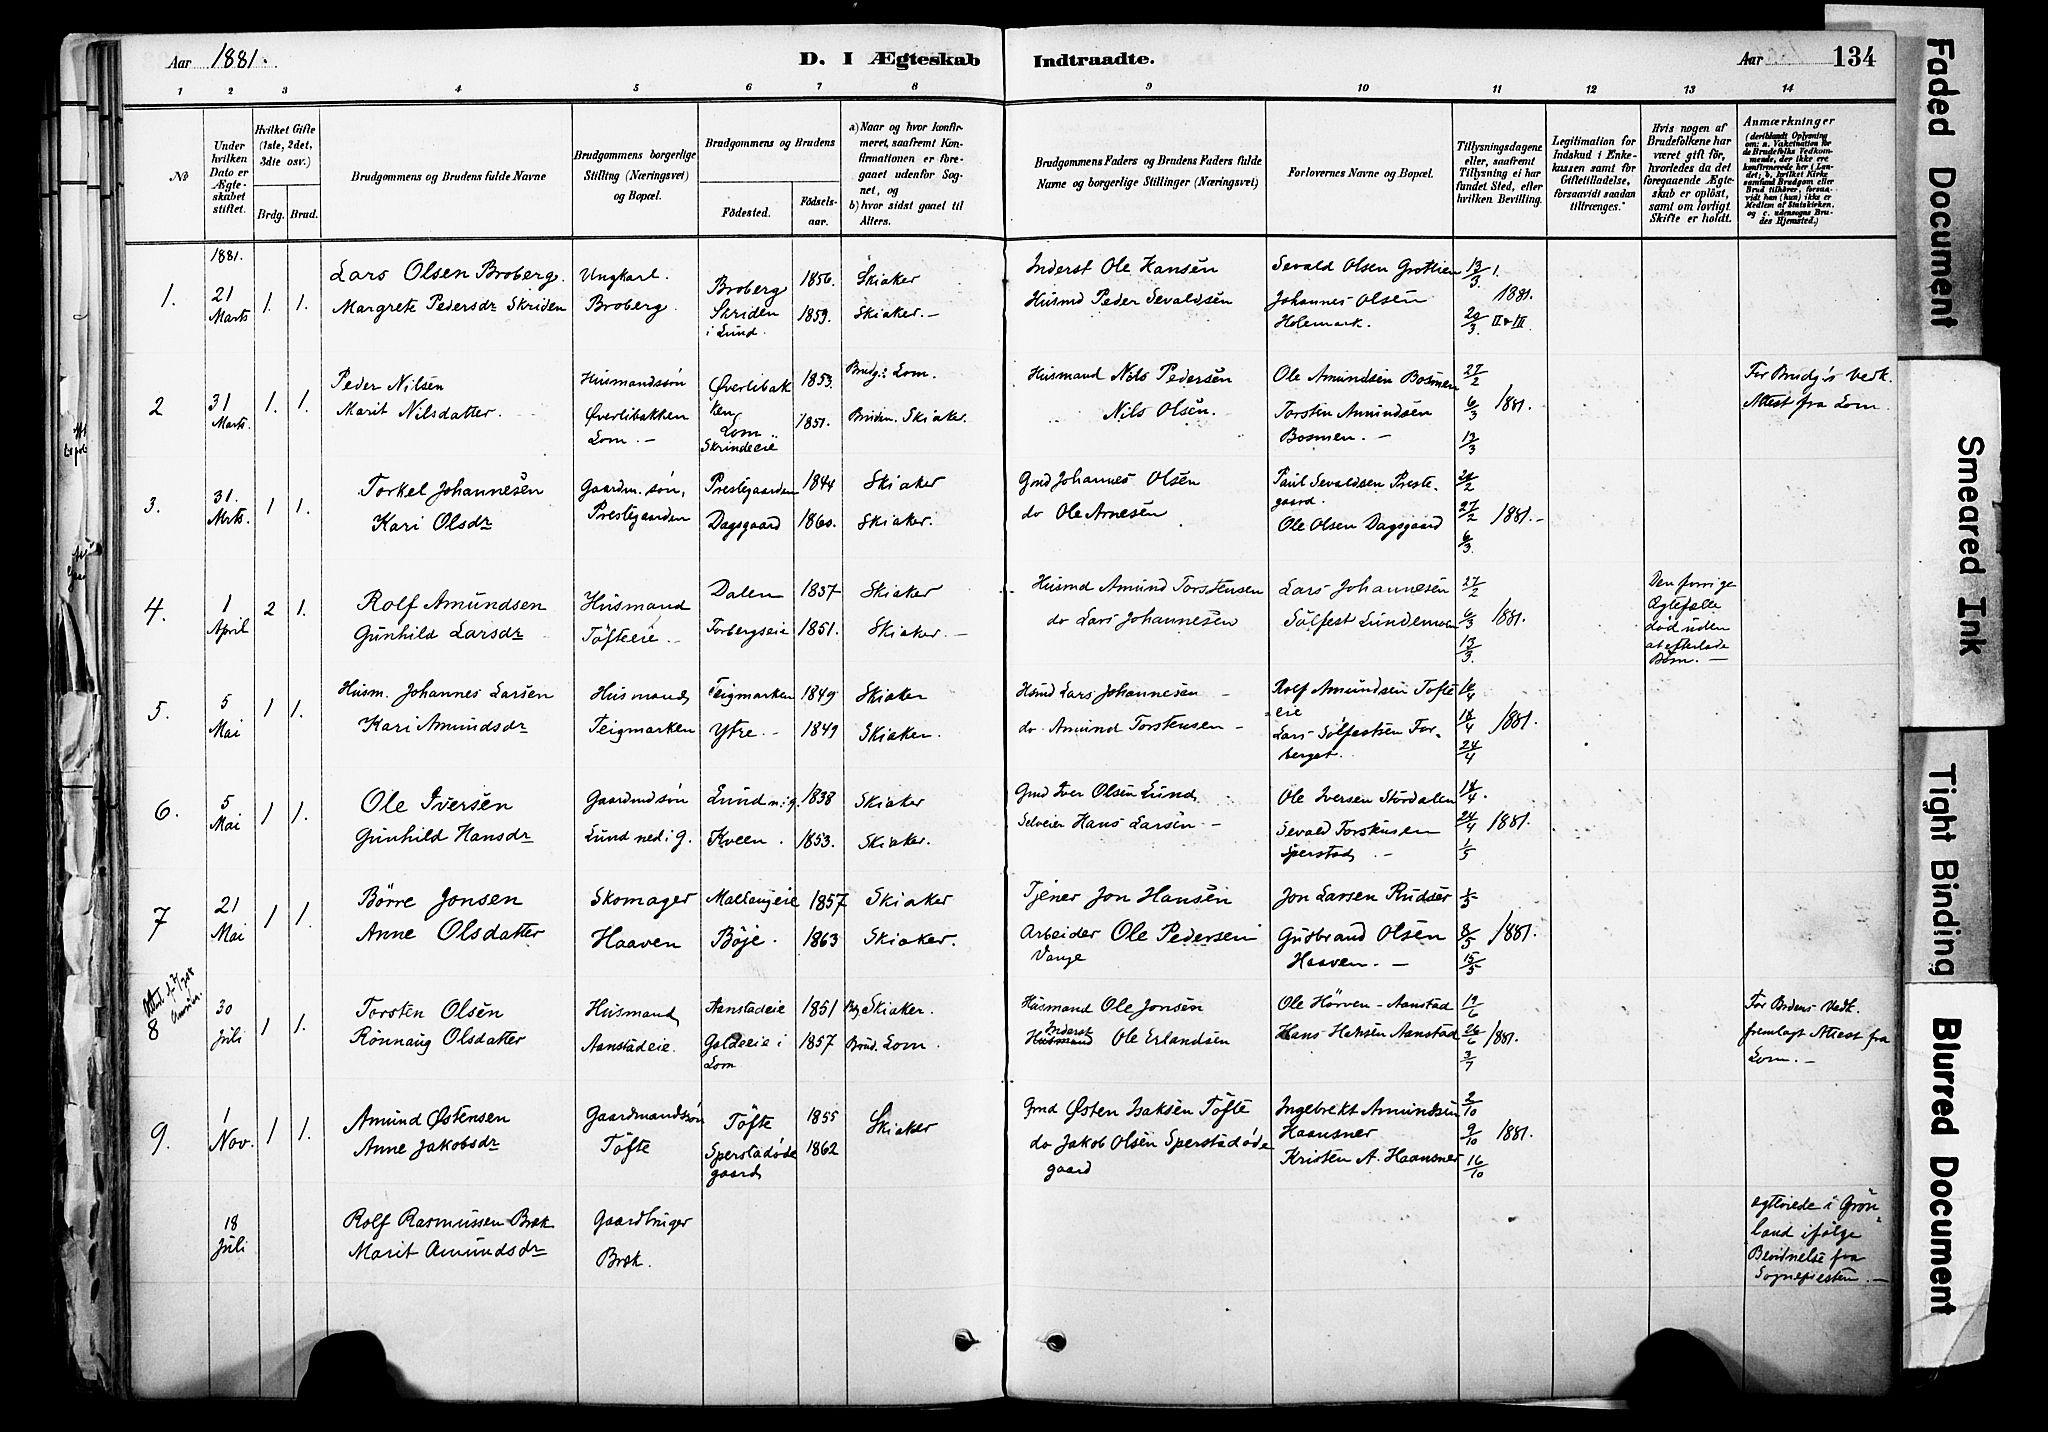 SAH, Skjåk prestekontor, Ministerialbok nr. 3, 1880-1907, s. 134